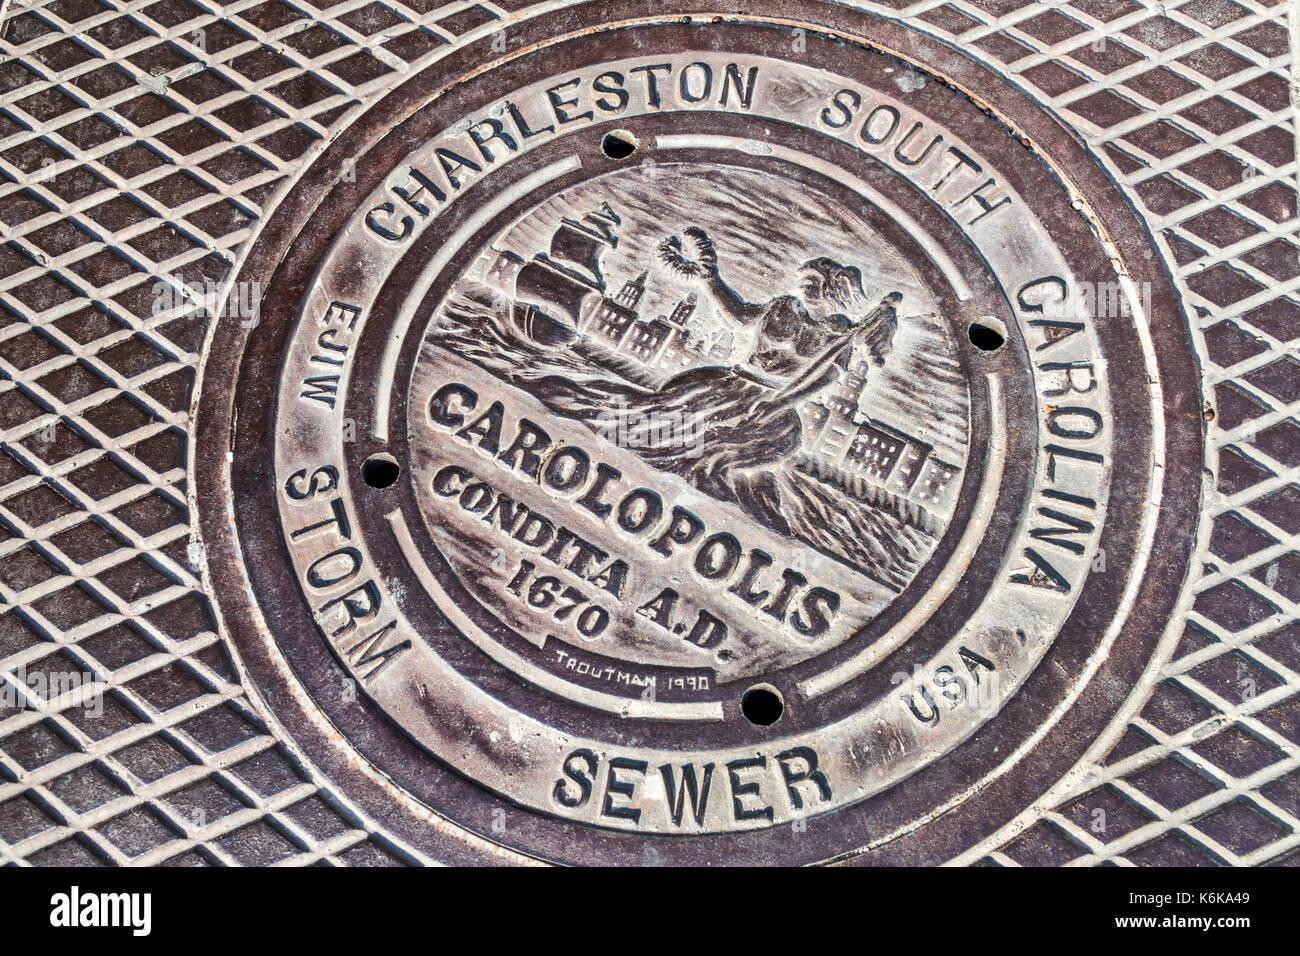 Charleston South Carolina SC Historic Downtown manhole cover sewer Carolopolis plate - Stock Image